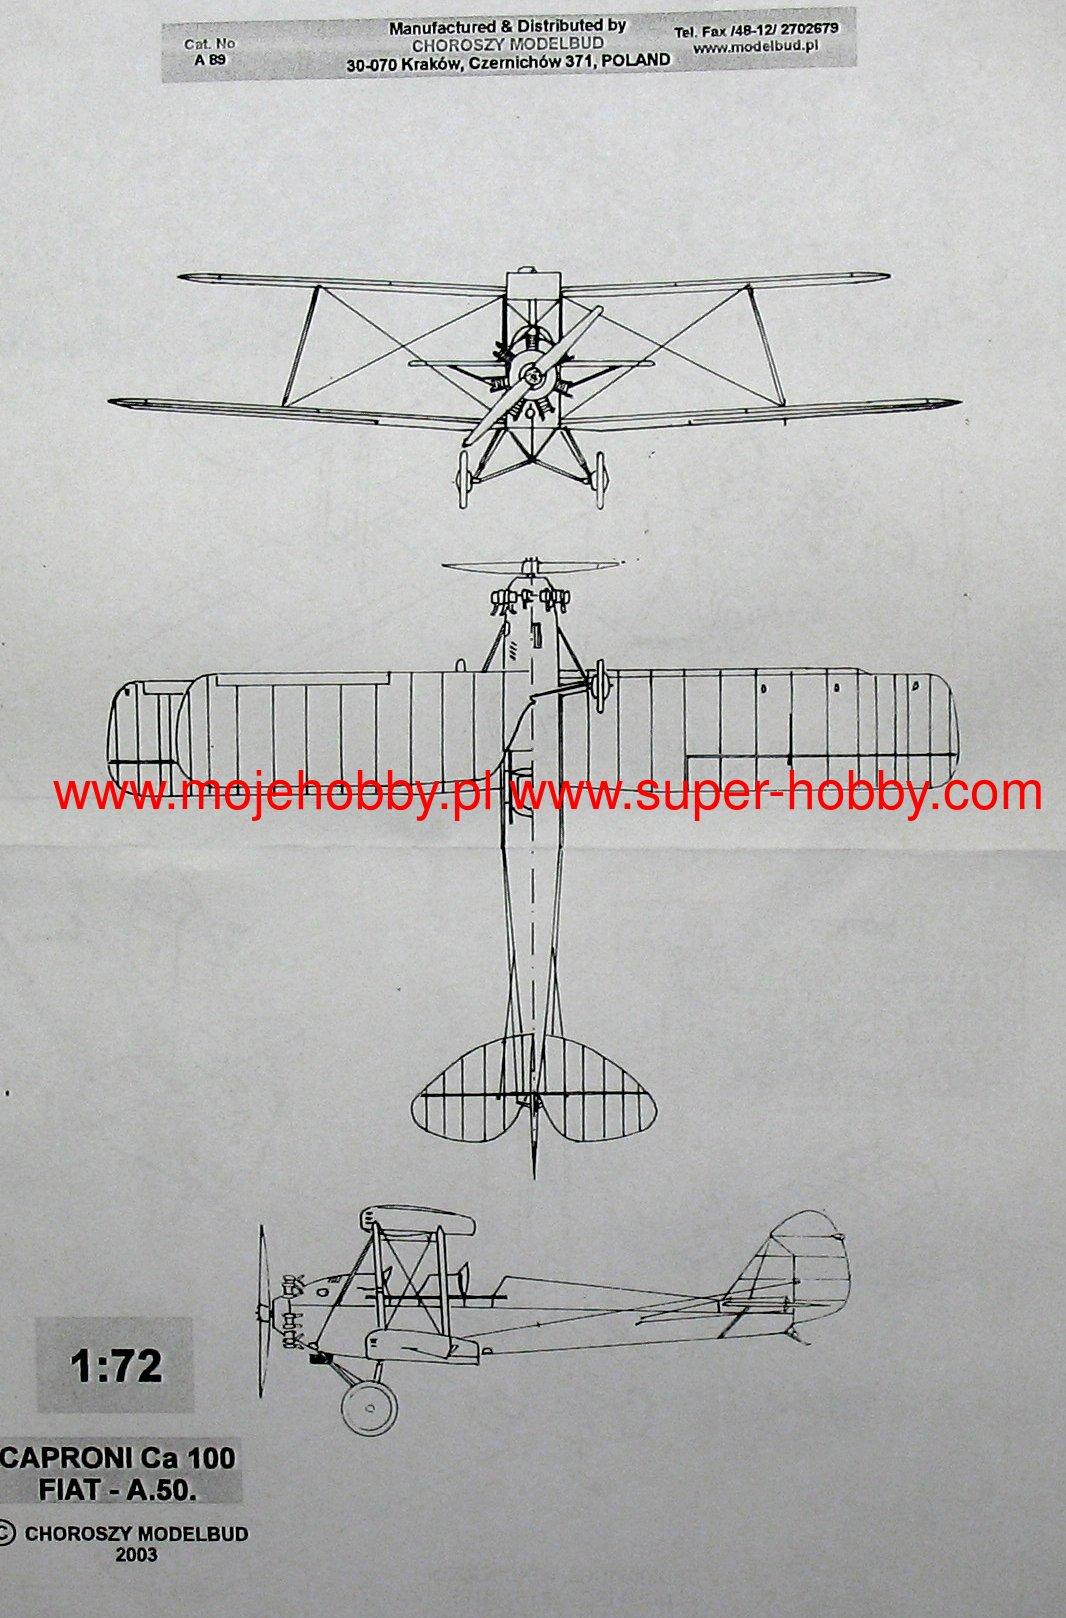 Ca 100 Fiat Engine Choroszy Modelbud A89 Diagram 2 Choa89 5